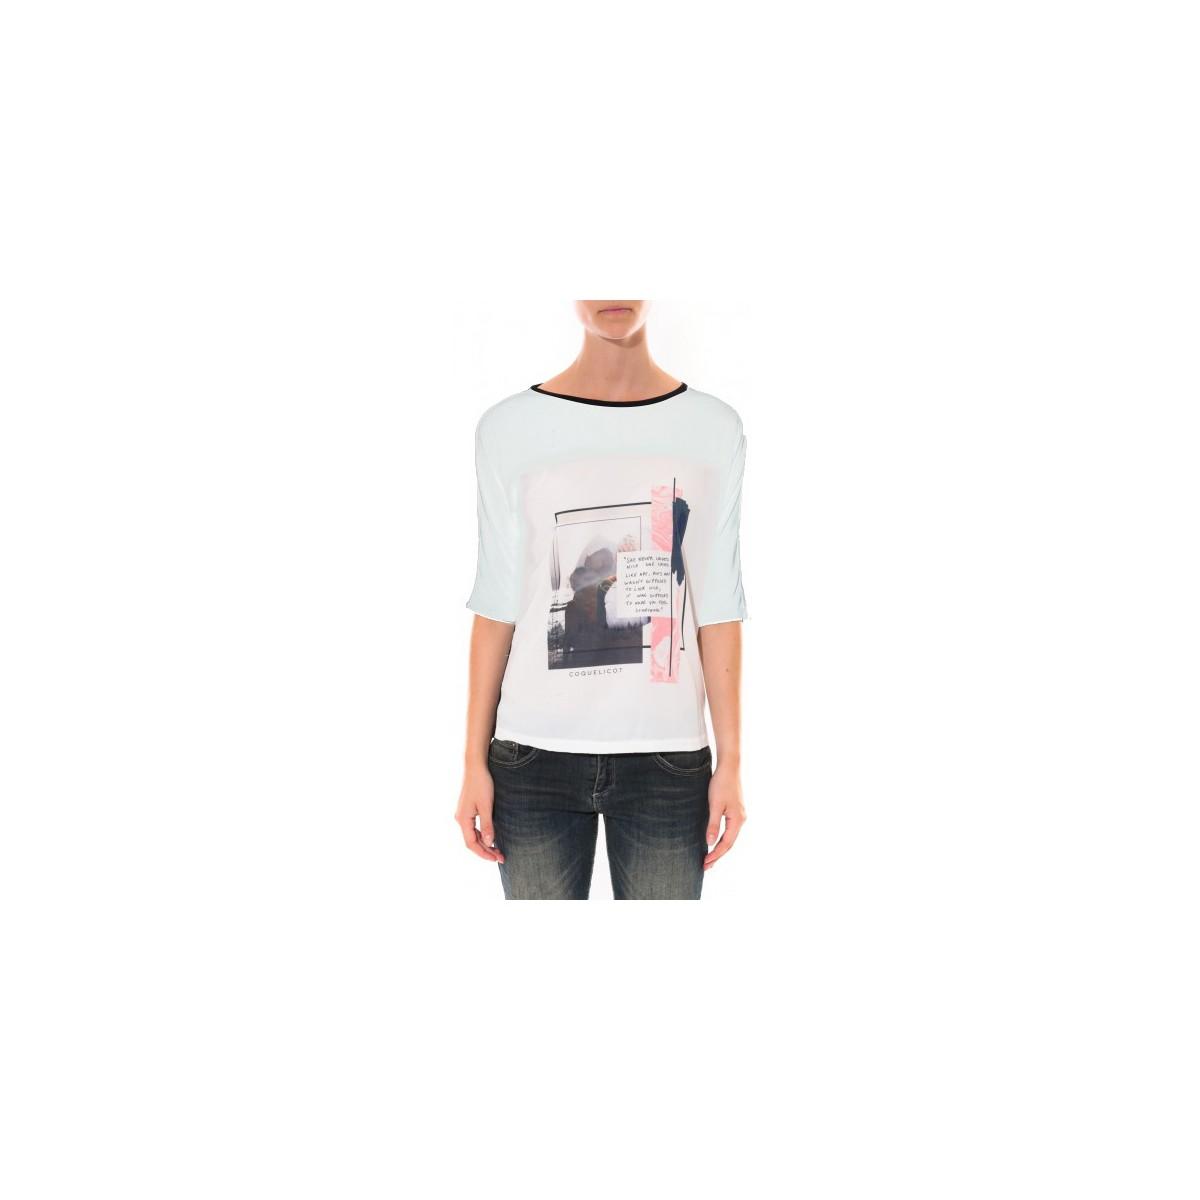 Coquelicot Tee shirt   Blanc 16409 Blanc